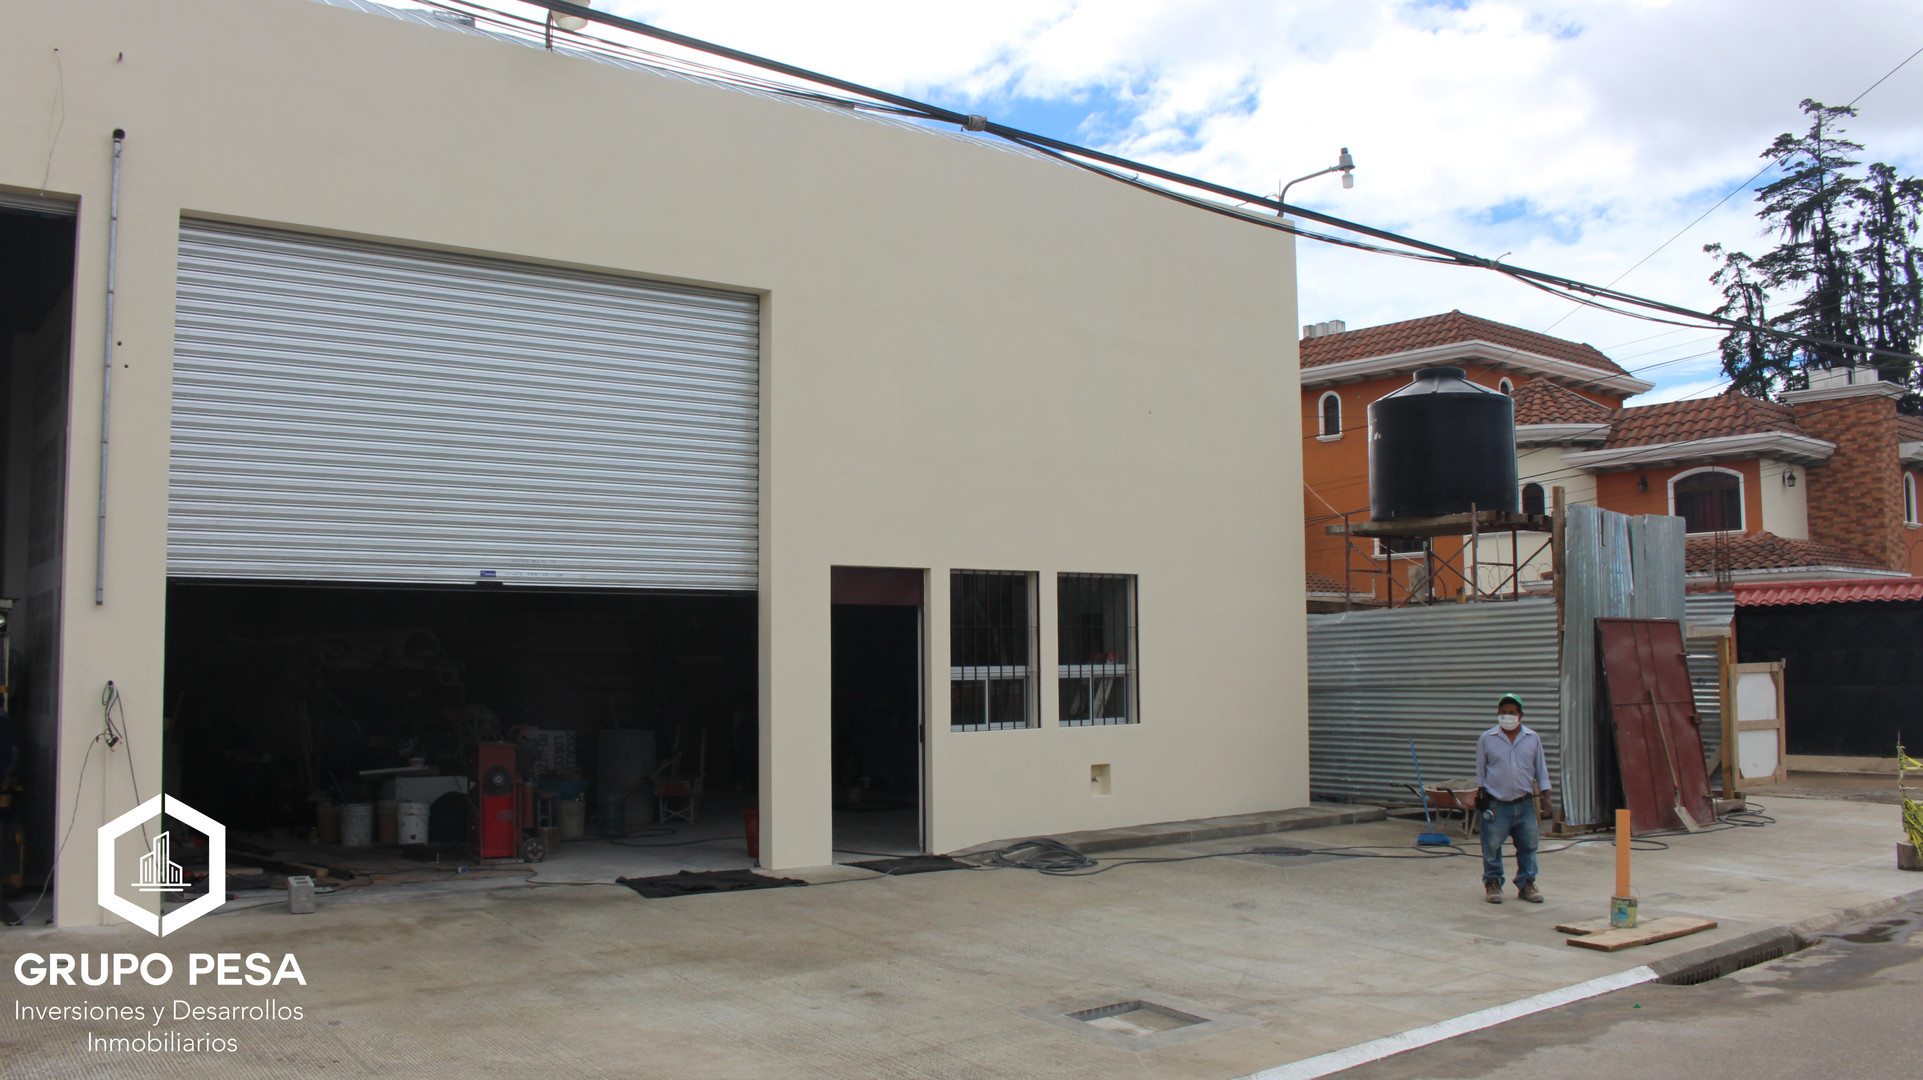 BodegaNueva| 20 Calle, Zona 4|Santa Cruz del Quiché